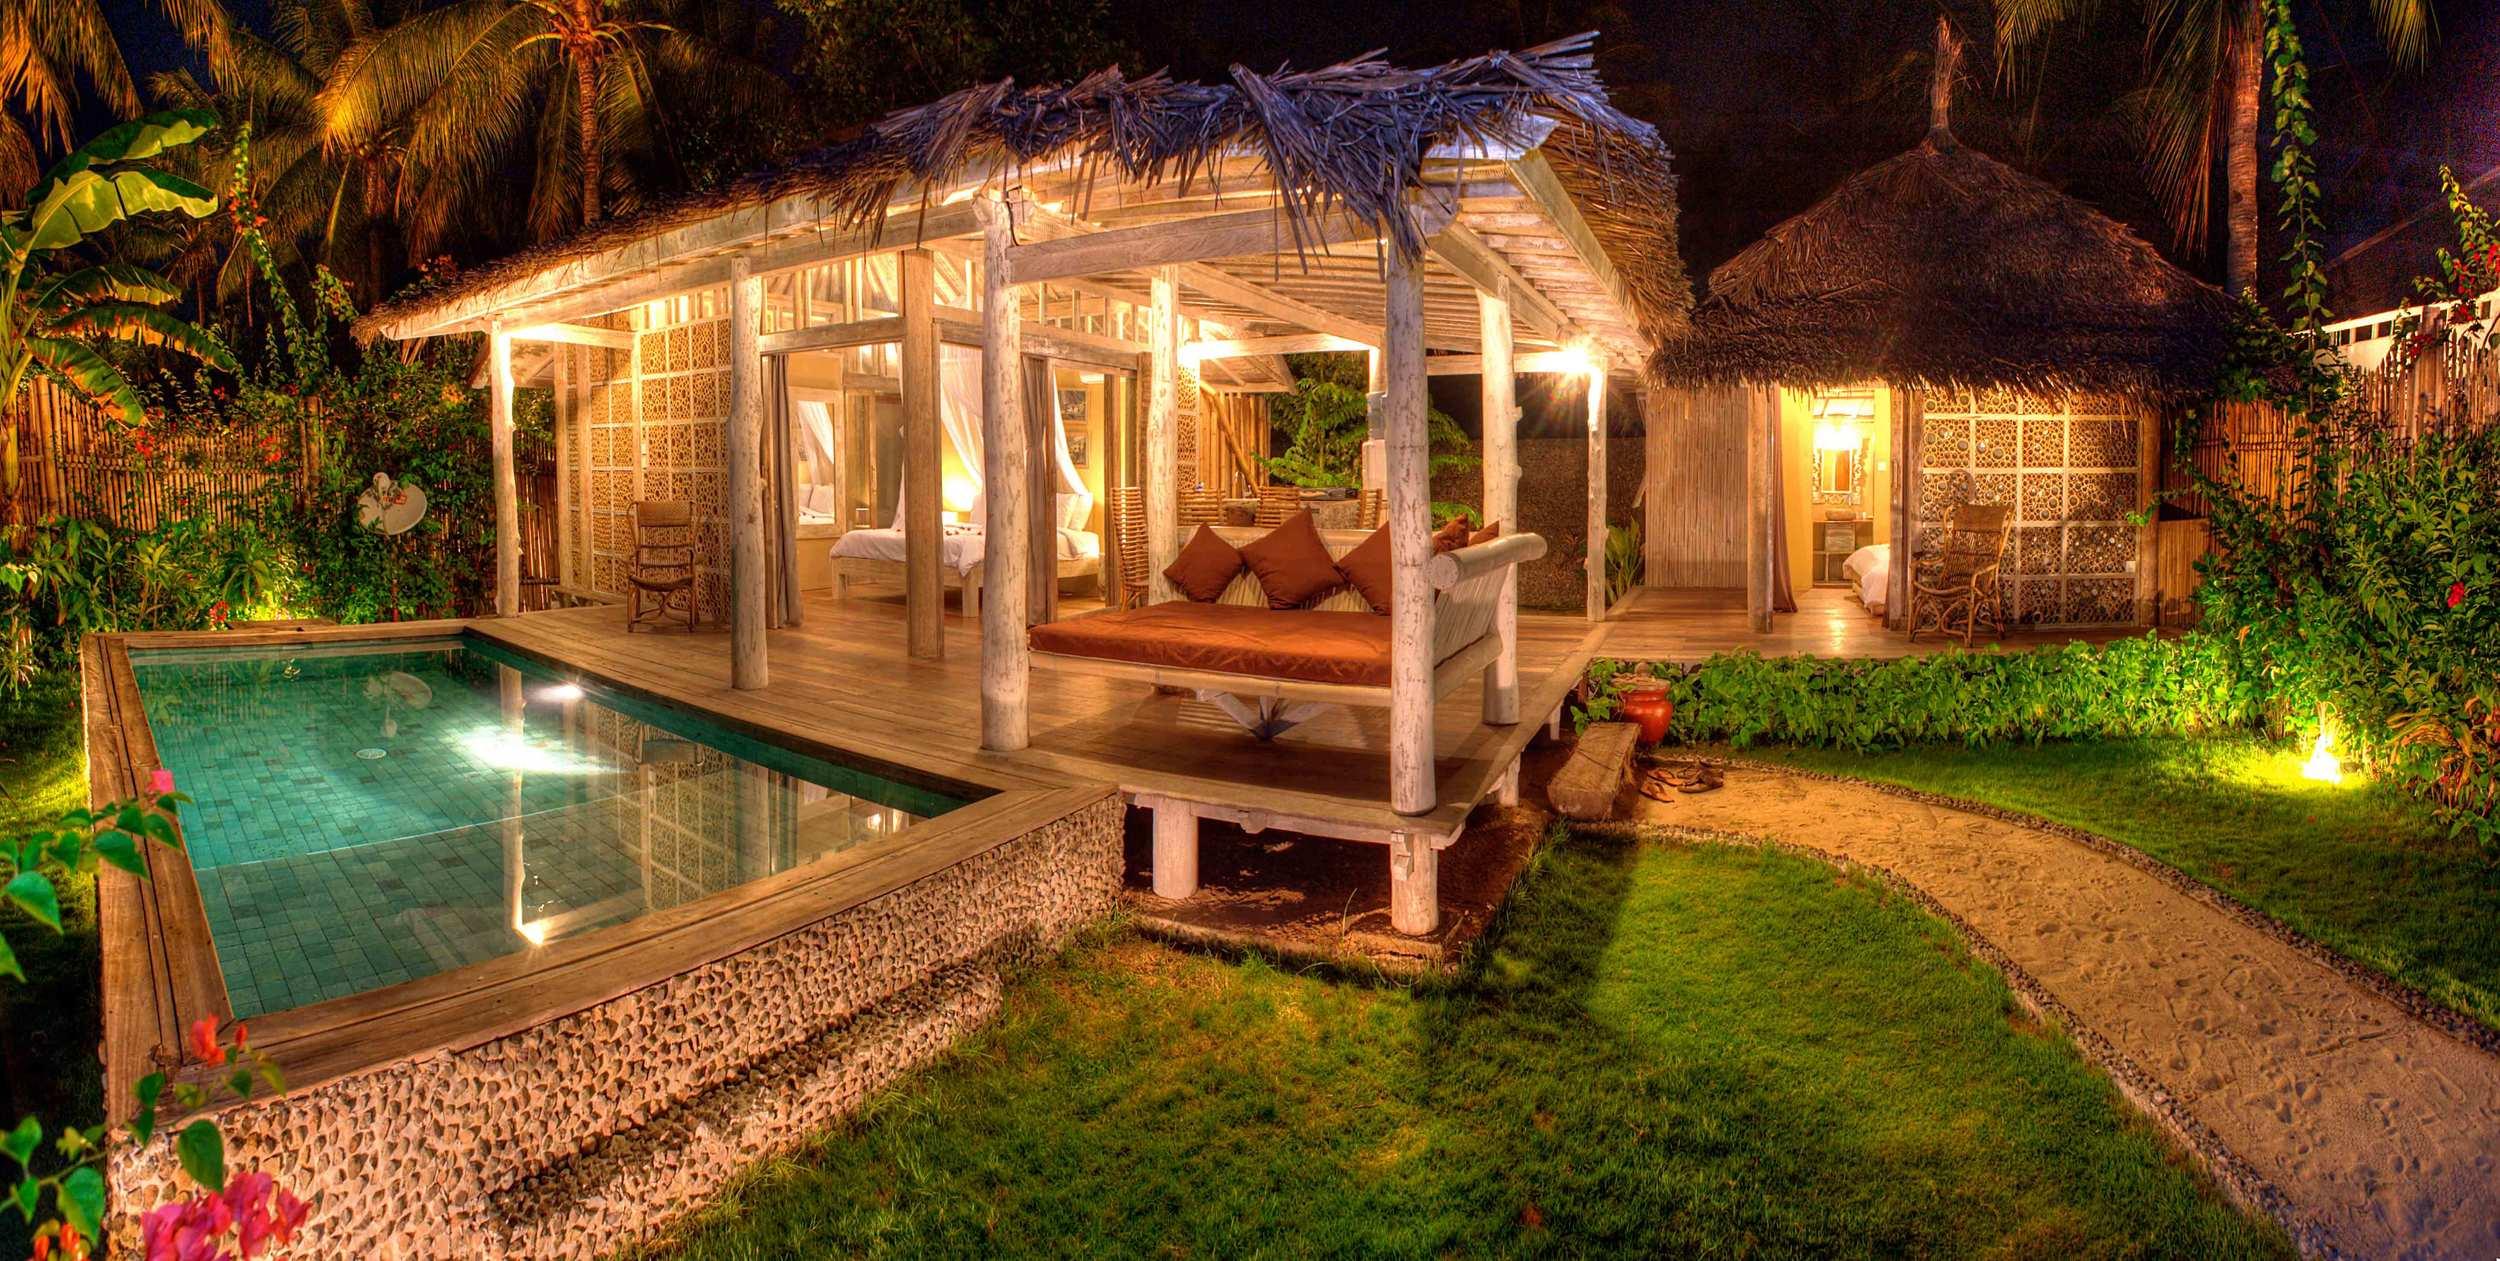 Villa deluxe 2 bedrooms by night